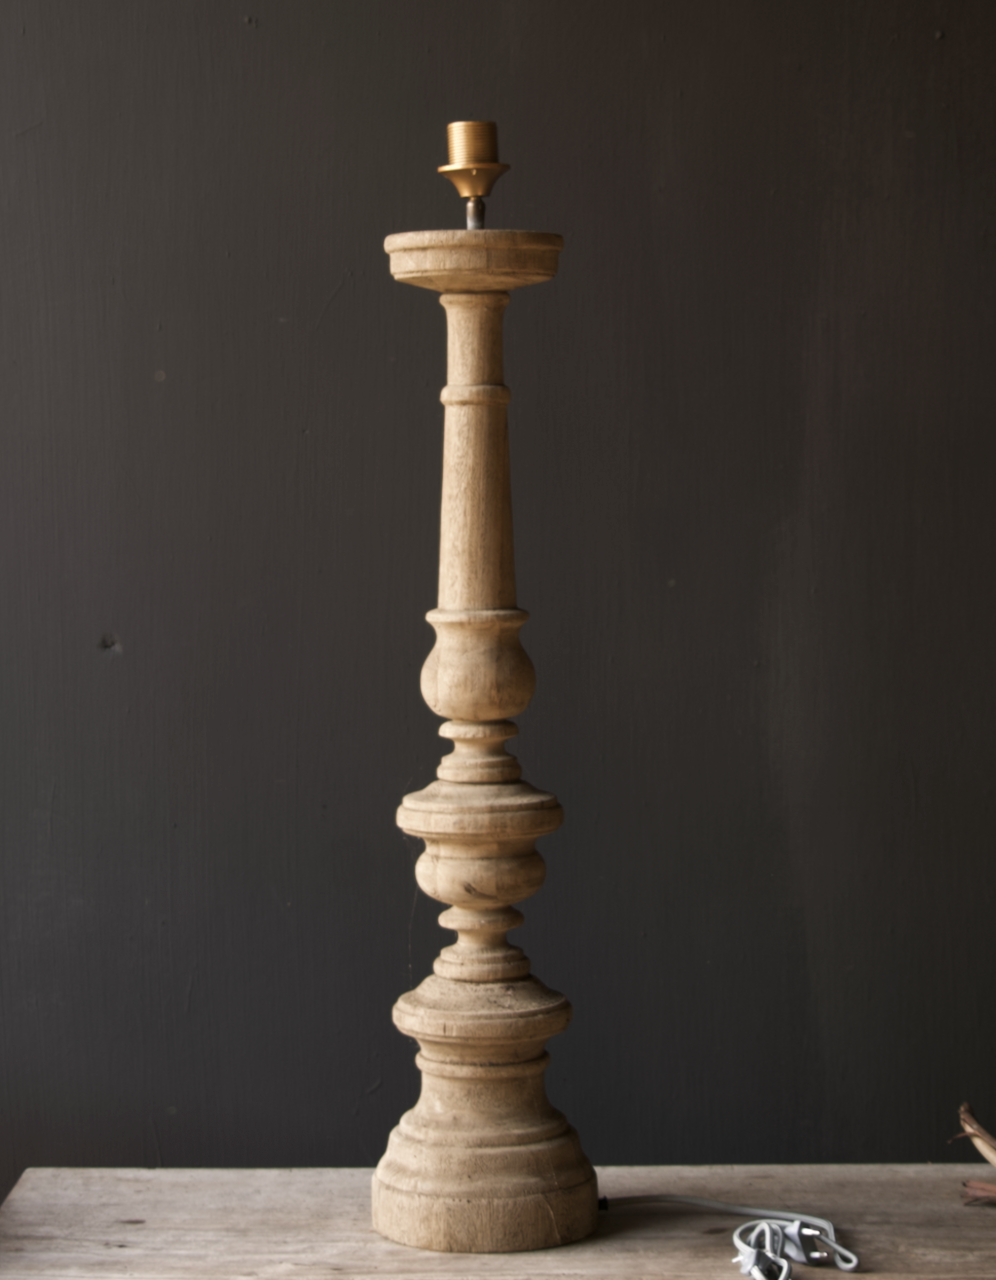 Eiken  Houten baluster lamp voet-2